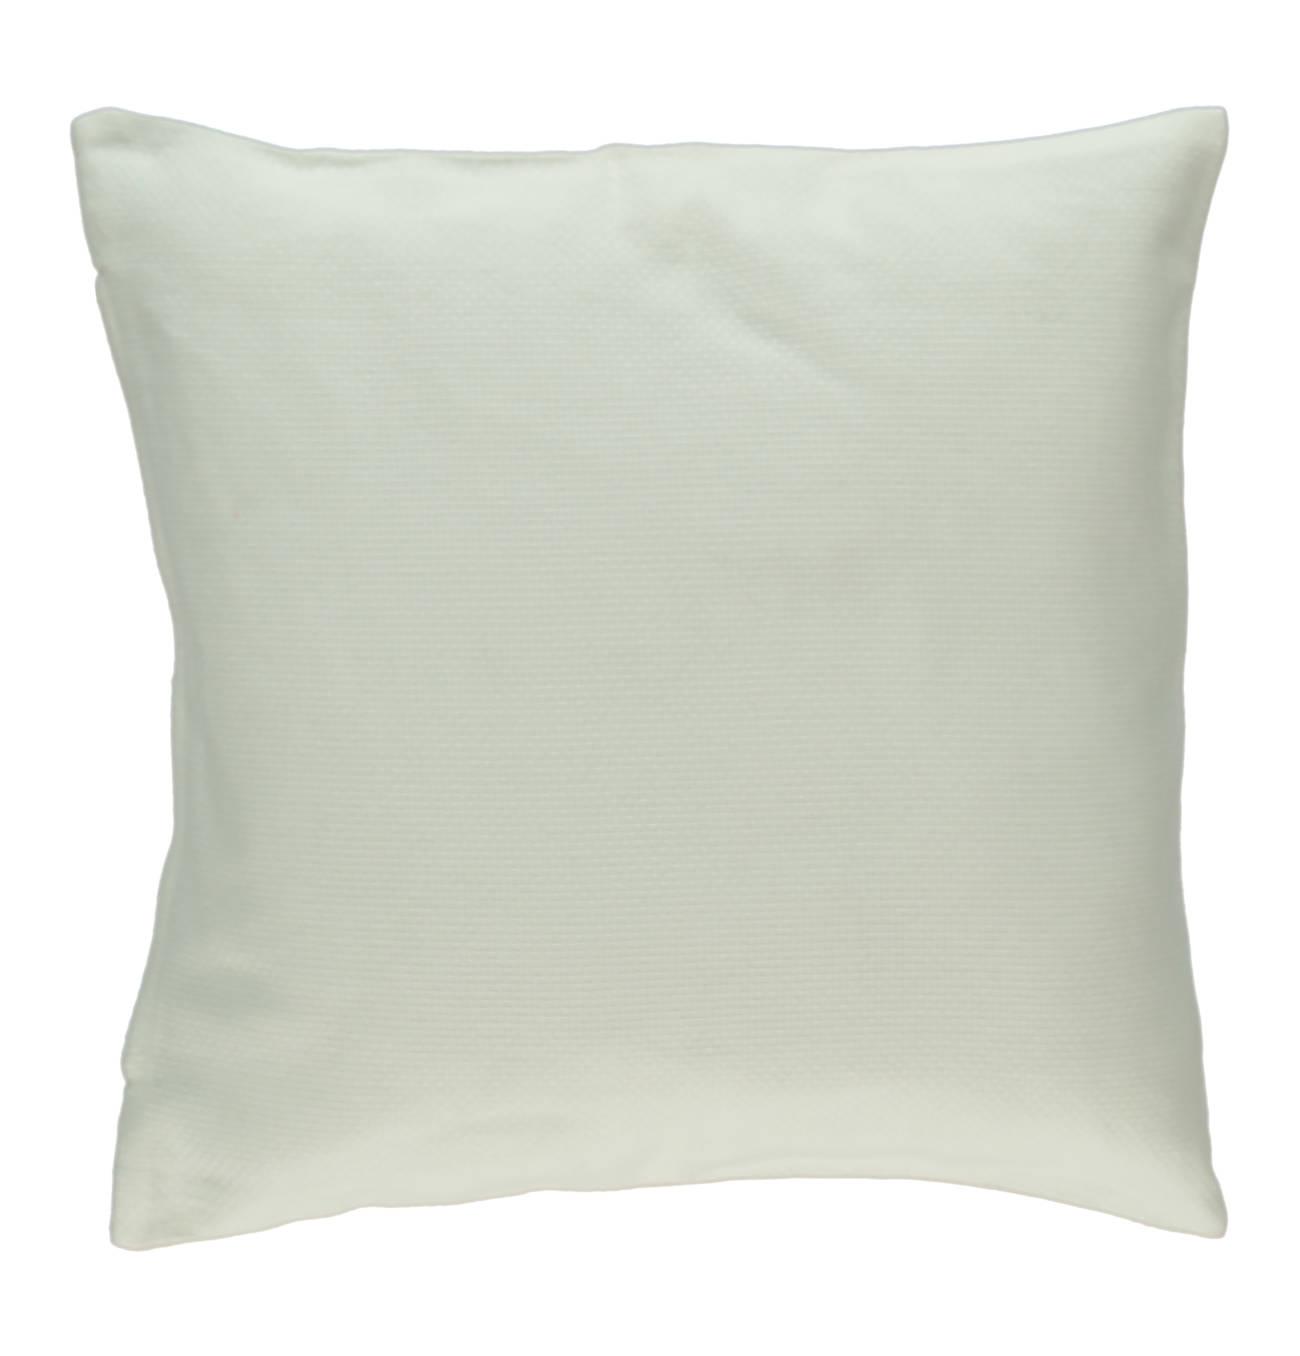 Scantex Kissenhulle Asia Jaquard Baumwolle 50 X 50 Cm